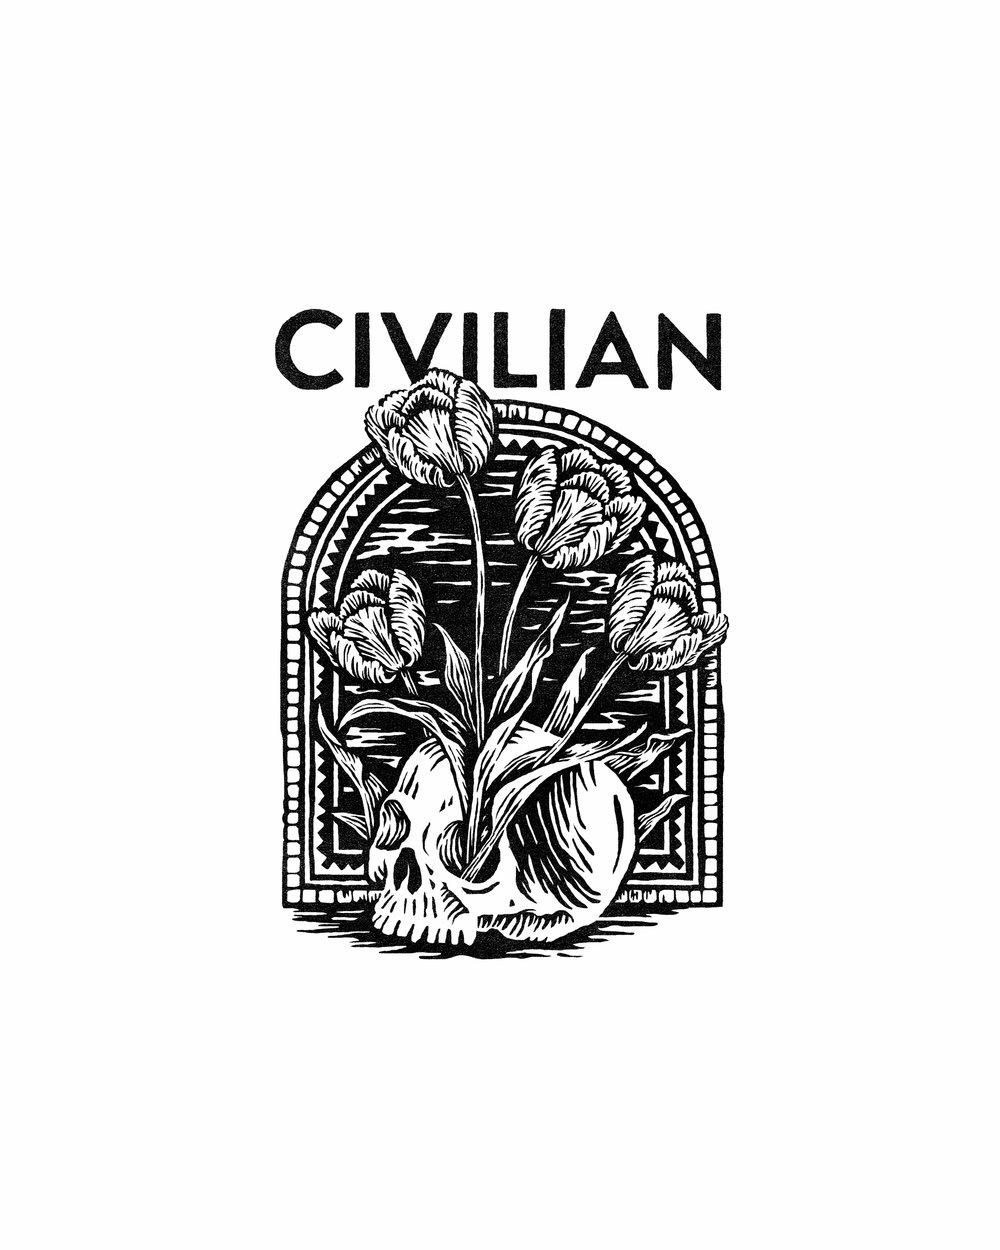 CIVILIAN_SMALL.jpg